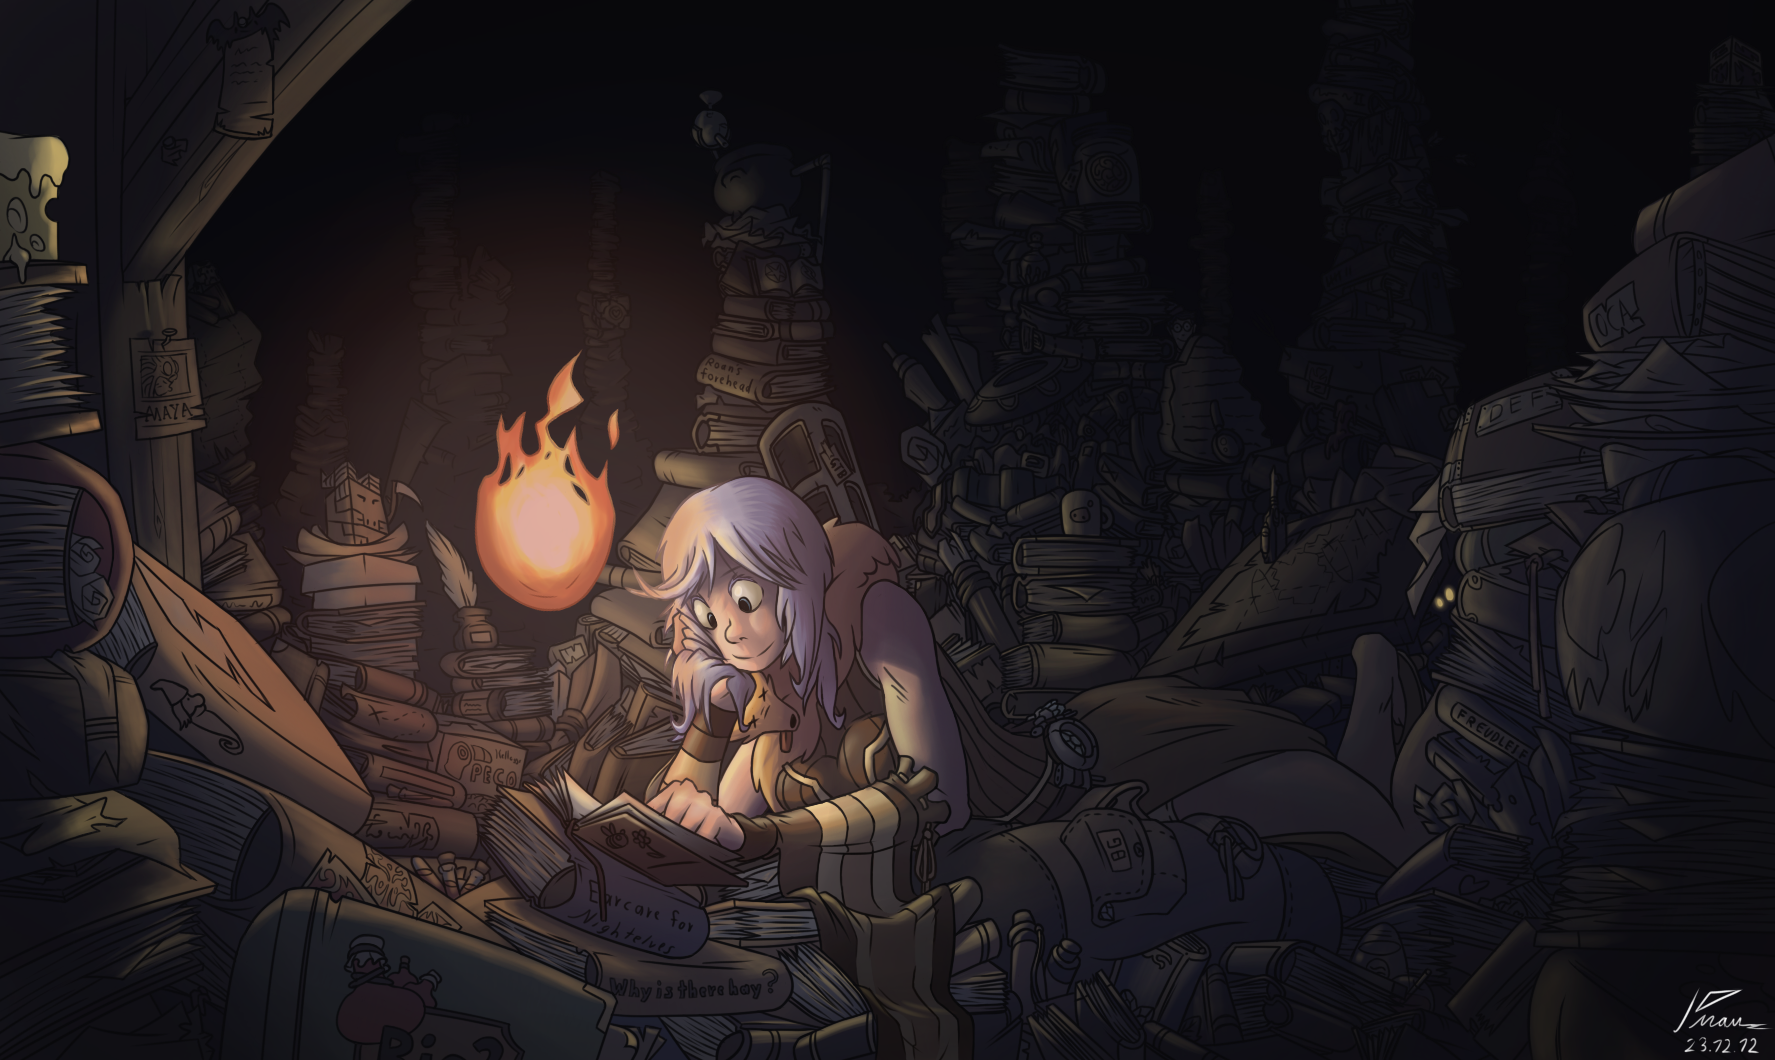 Scholar in the attic